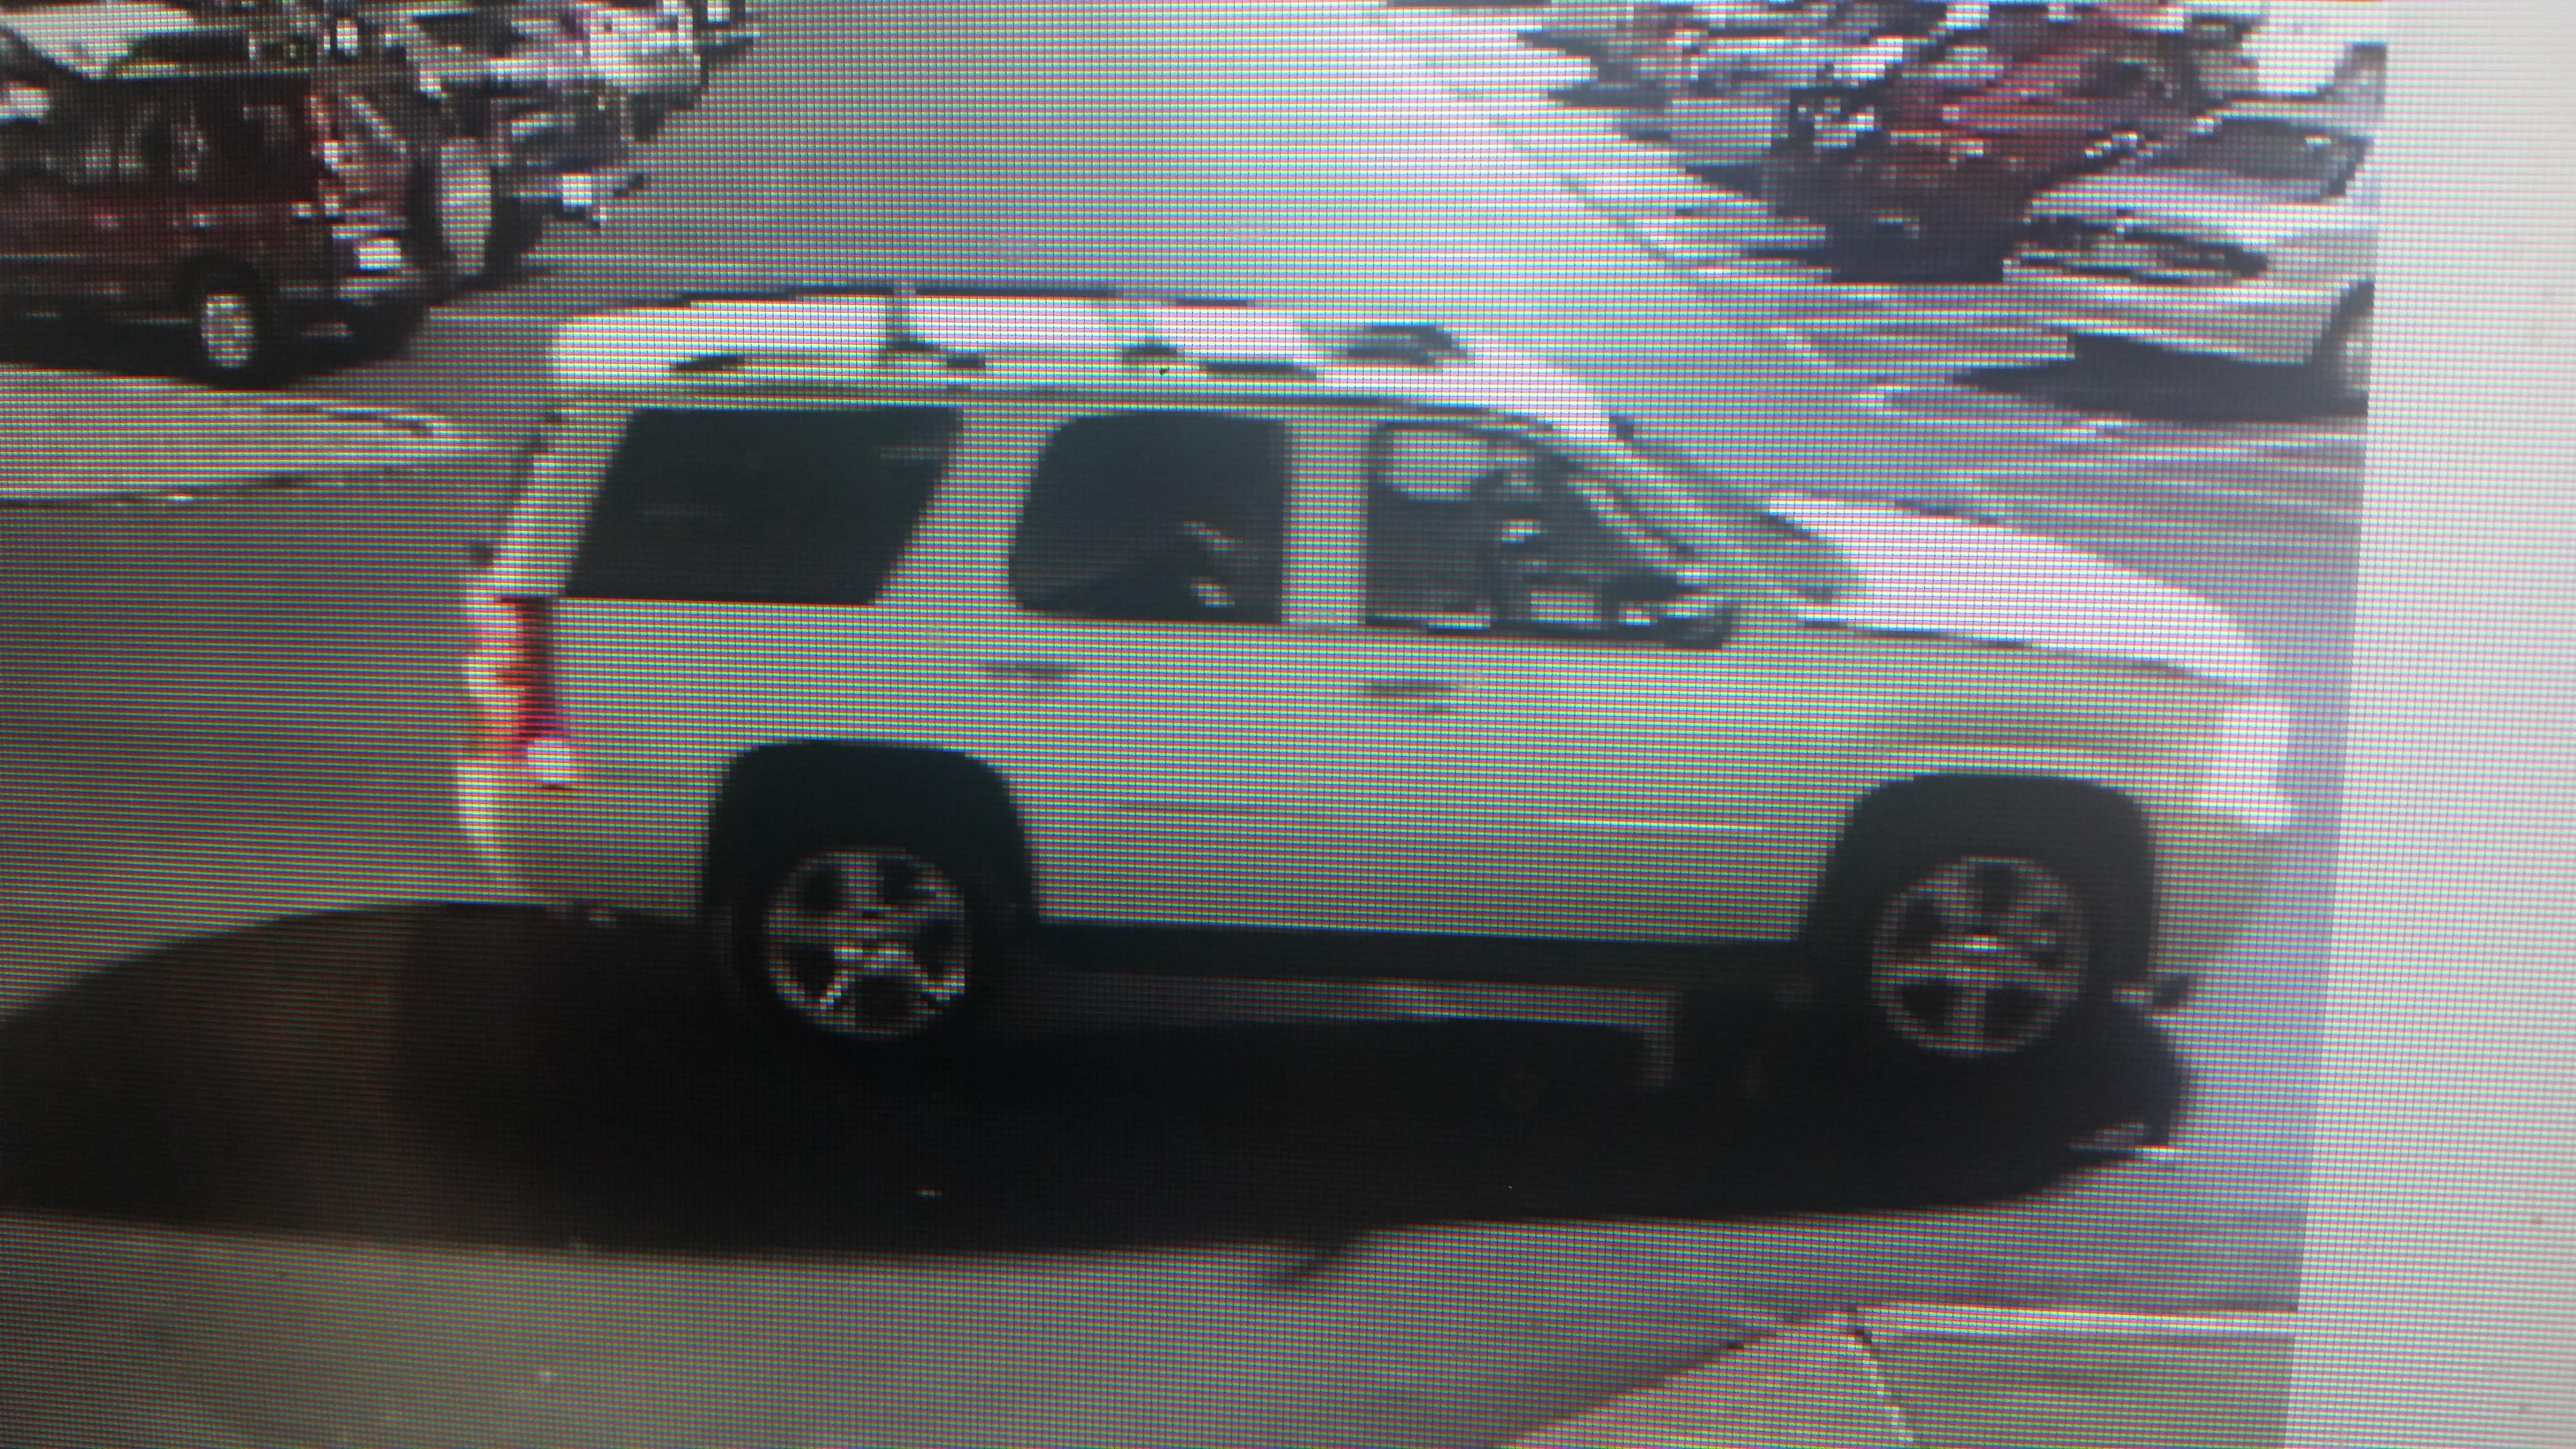 Police seek public's help in locating vehicle involved in Lee's Summit shooting